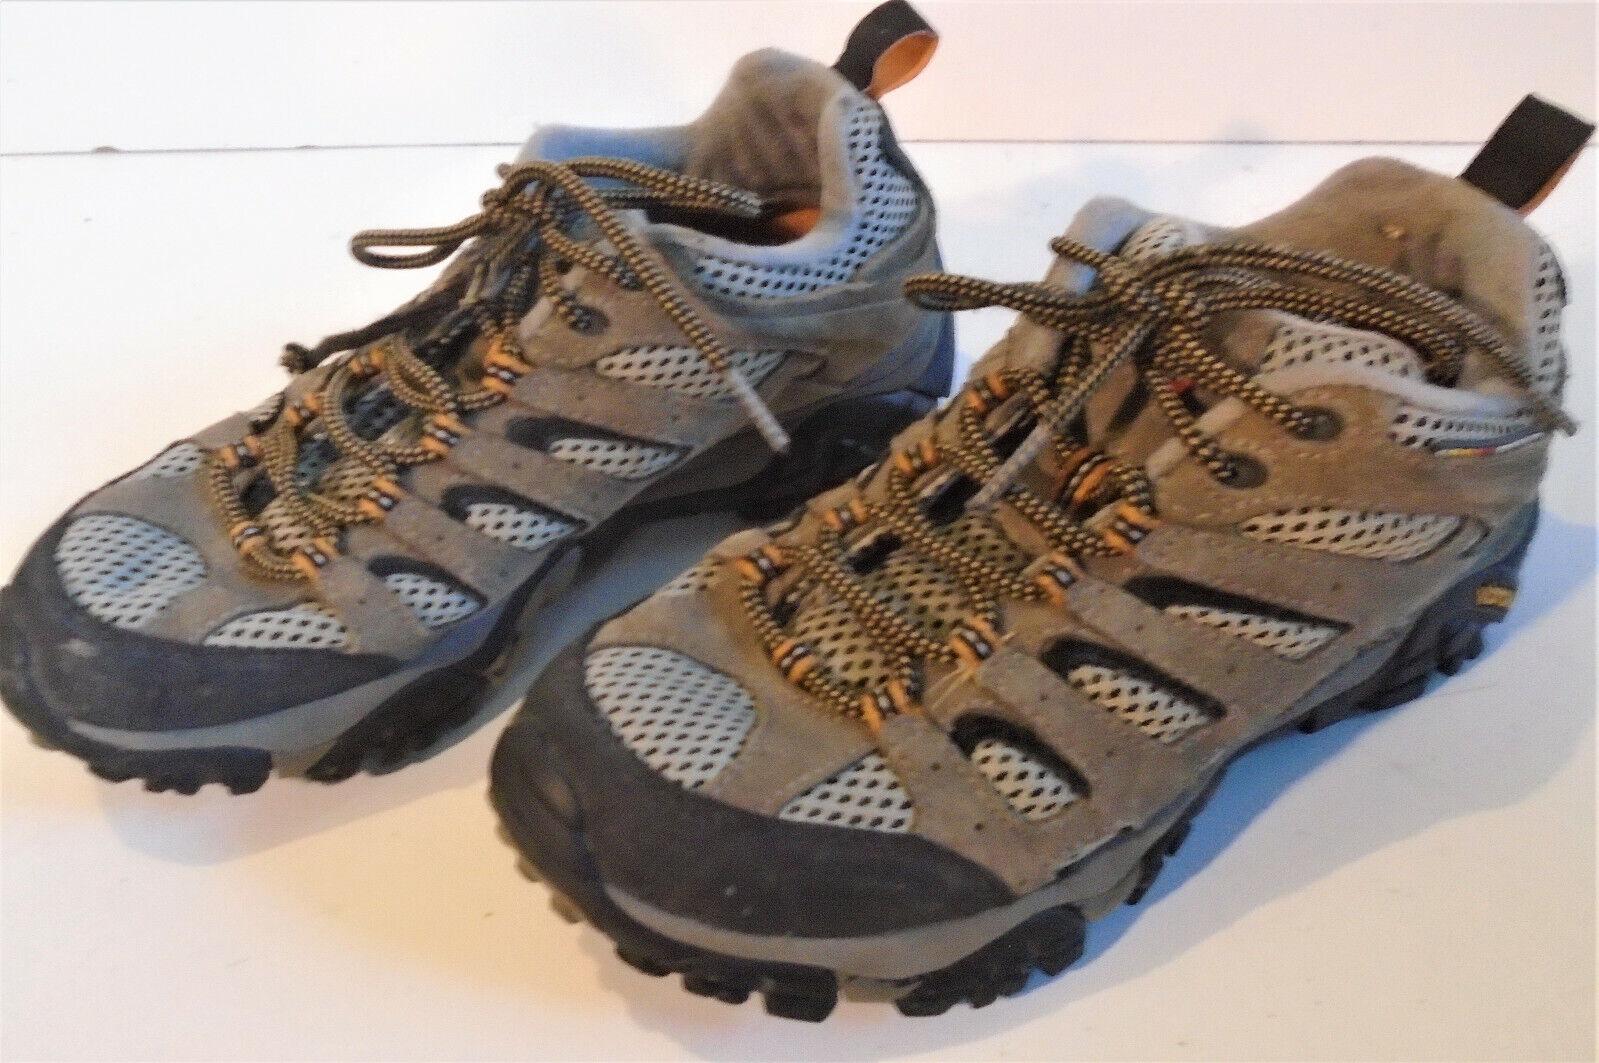 MERRELL Walnut Continuum Vibram Sole Men's Hiking Outdoor Shoes Size 7